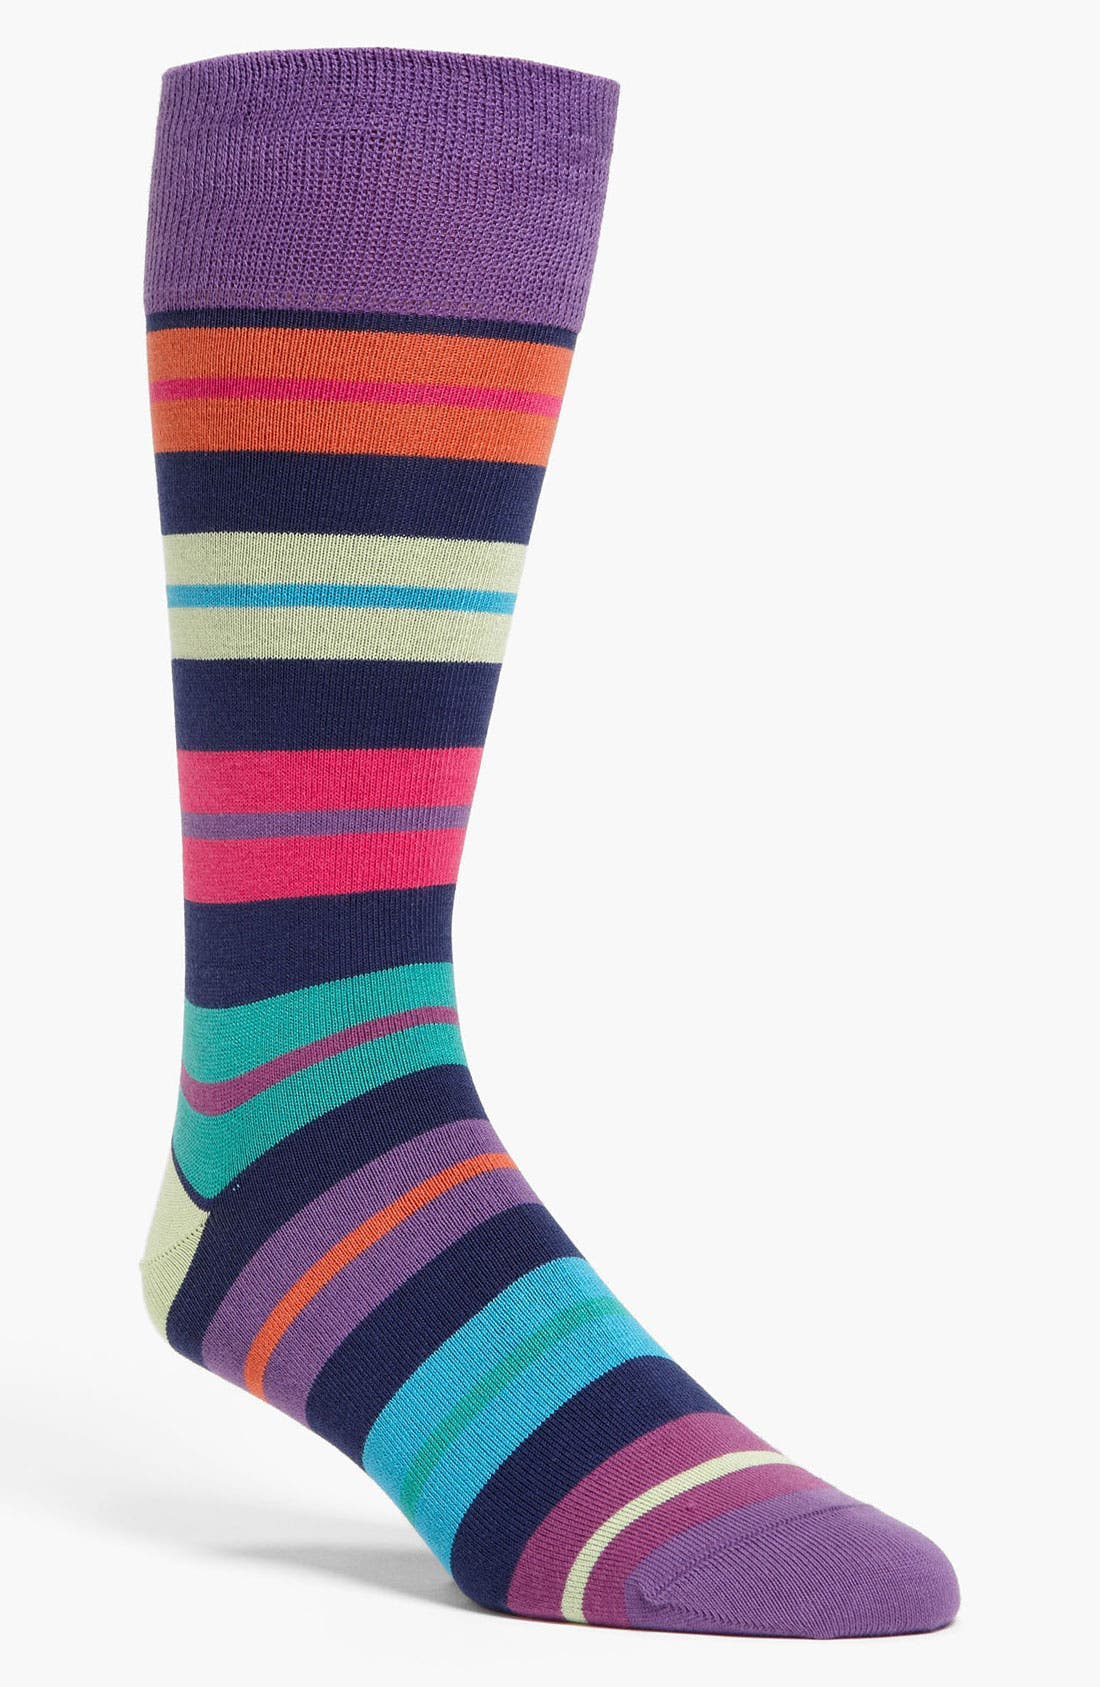 Main Image - Paul Smith Accessories Block Stripe Socks